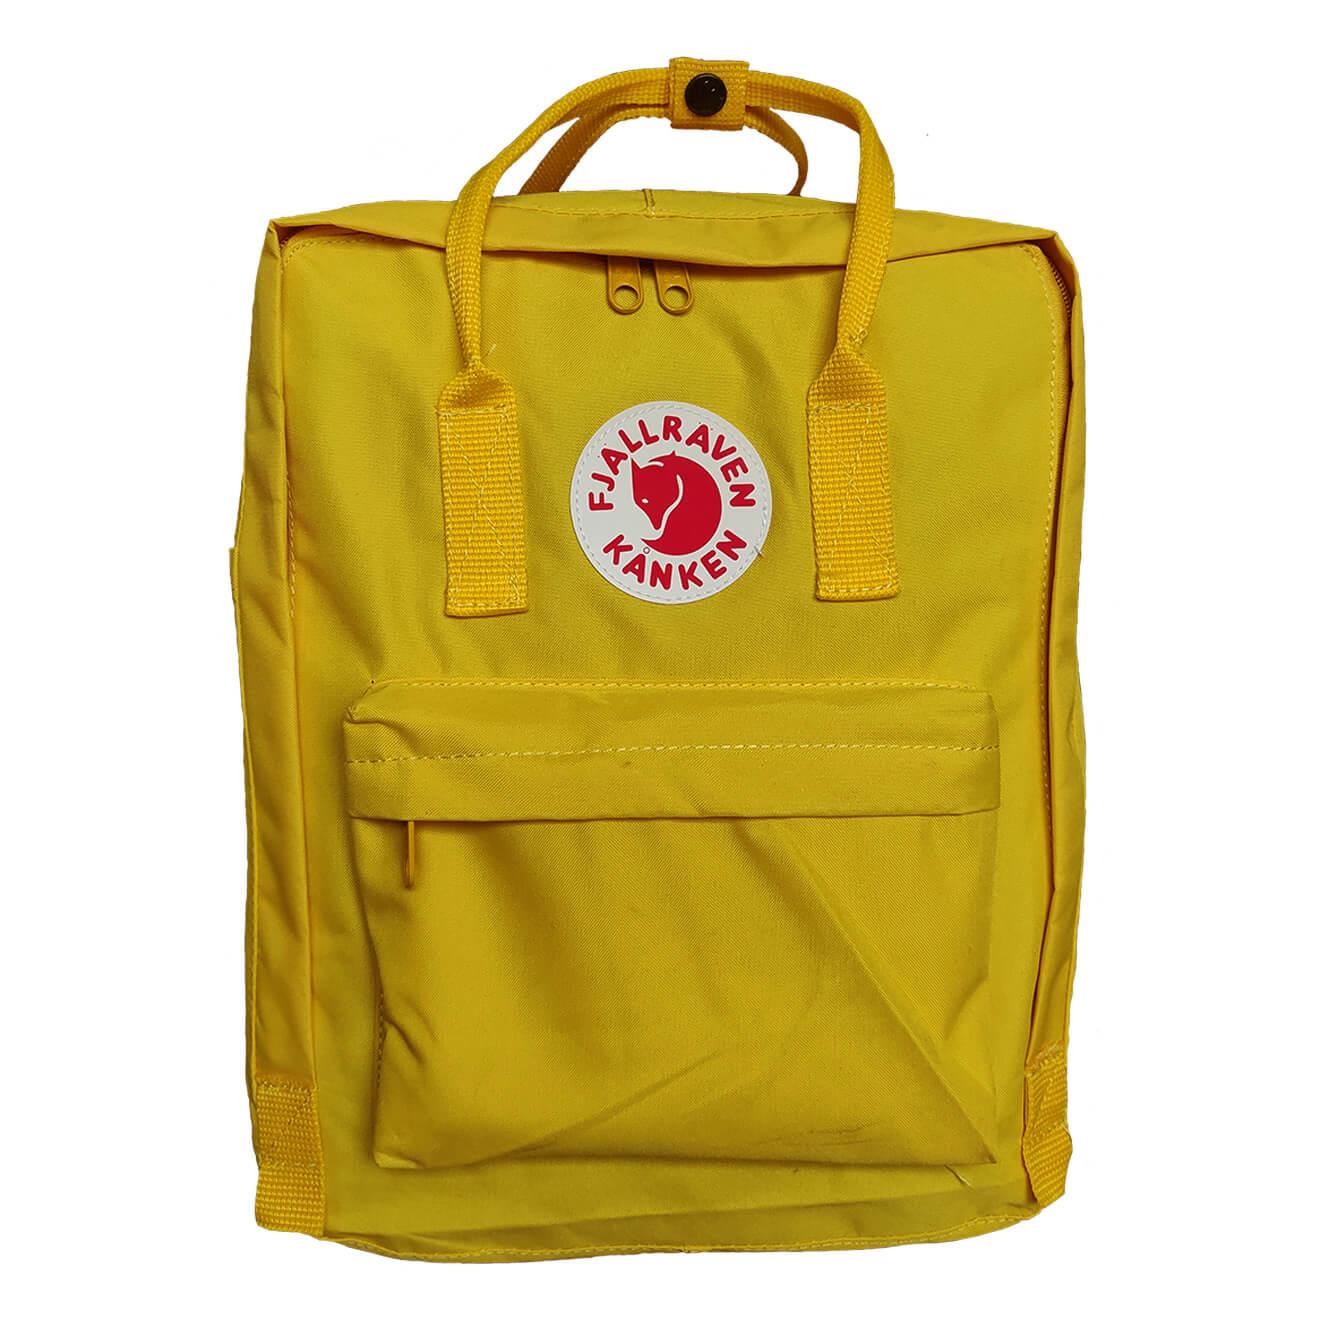 22d94d2cf Fjallraven Kanken Classic Warm Yellow - Retro Bags